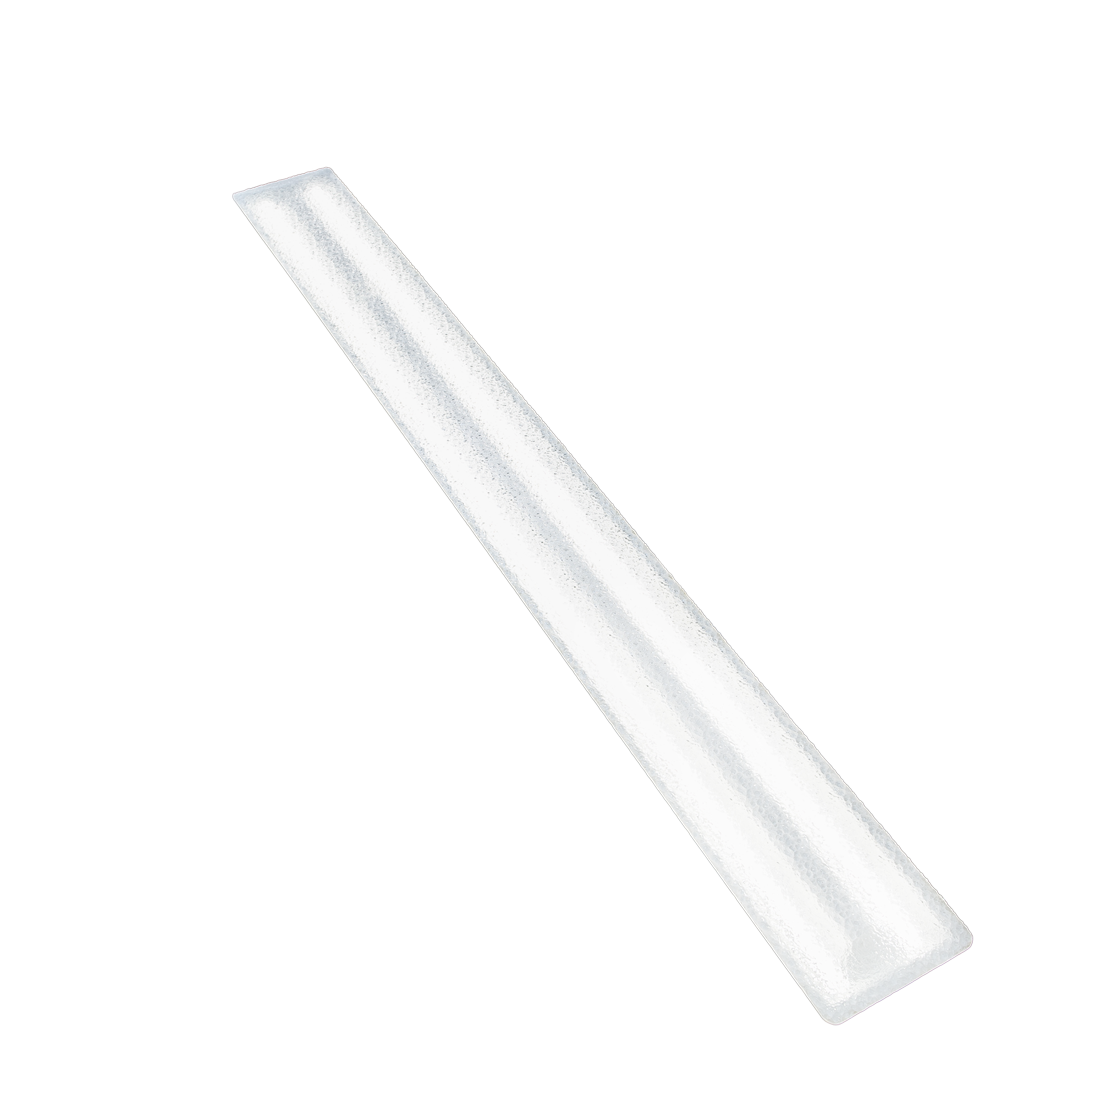 Светильник LED Сеть Ice 36Вт 4000K 5090Лм